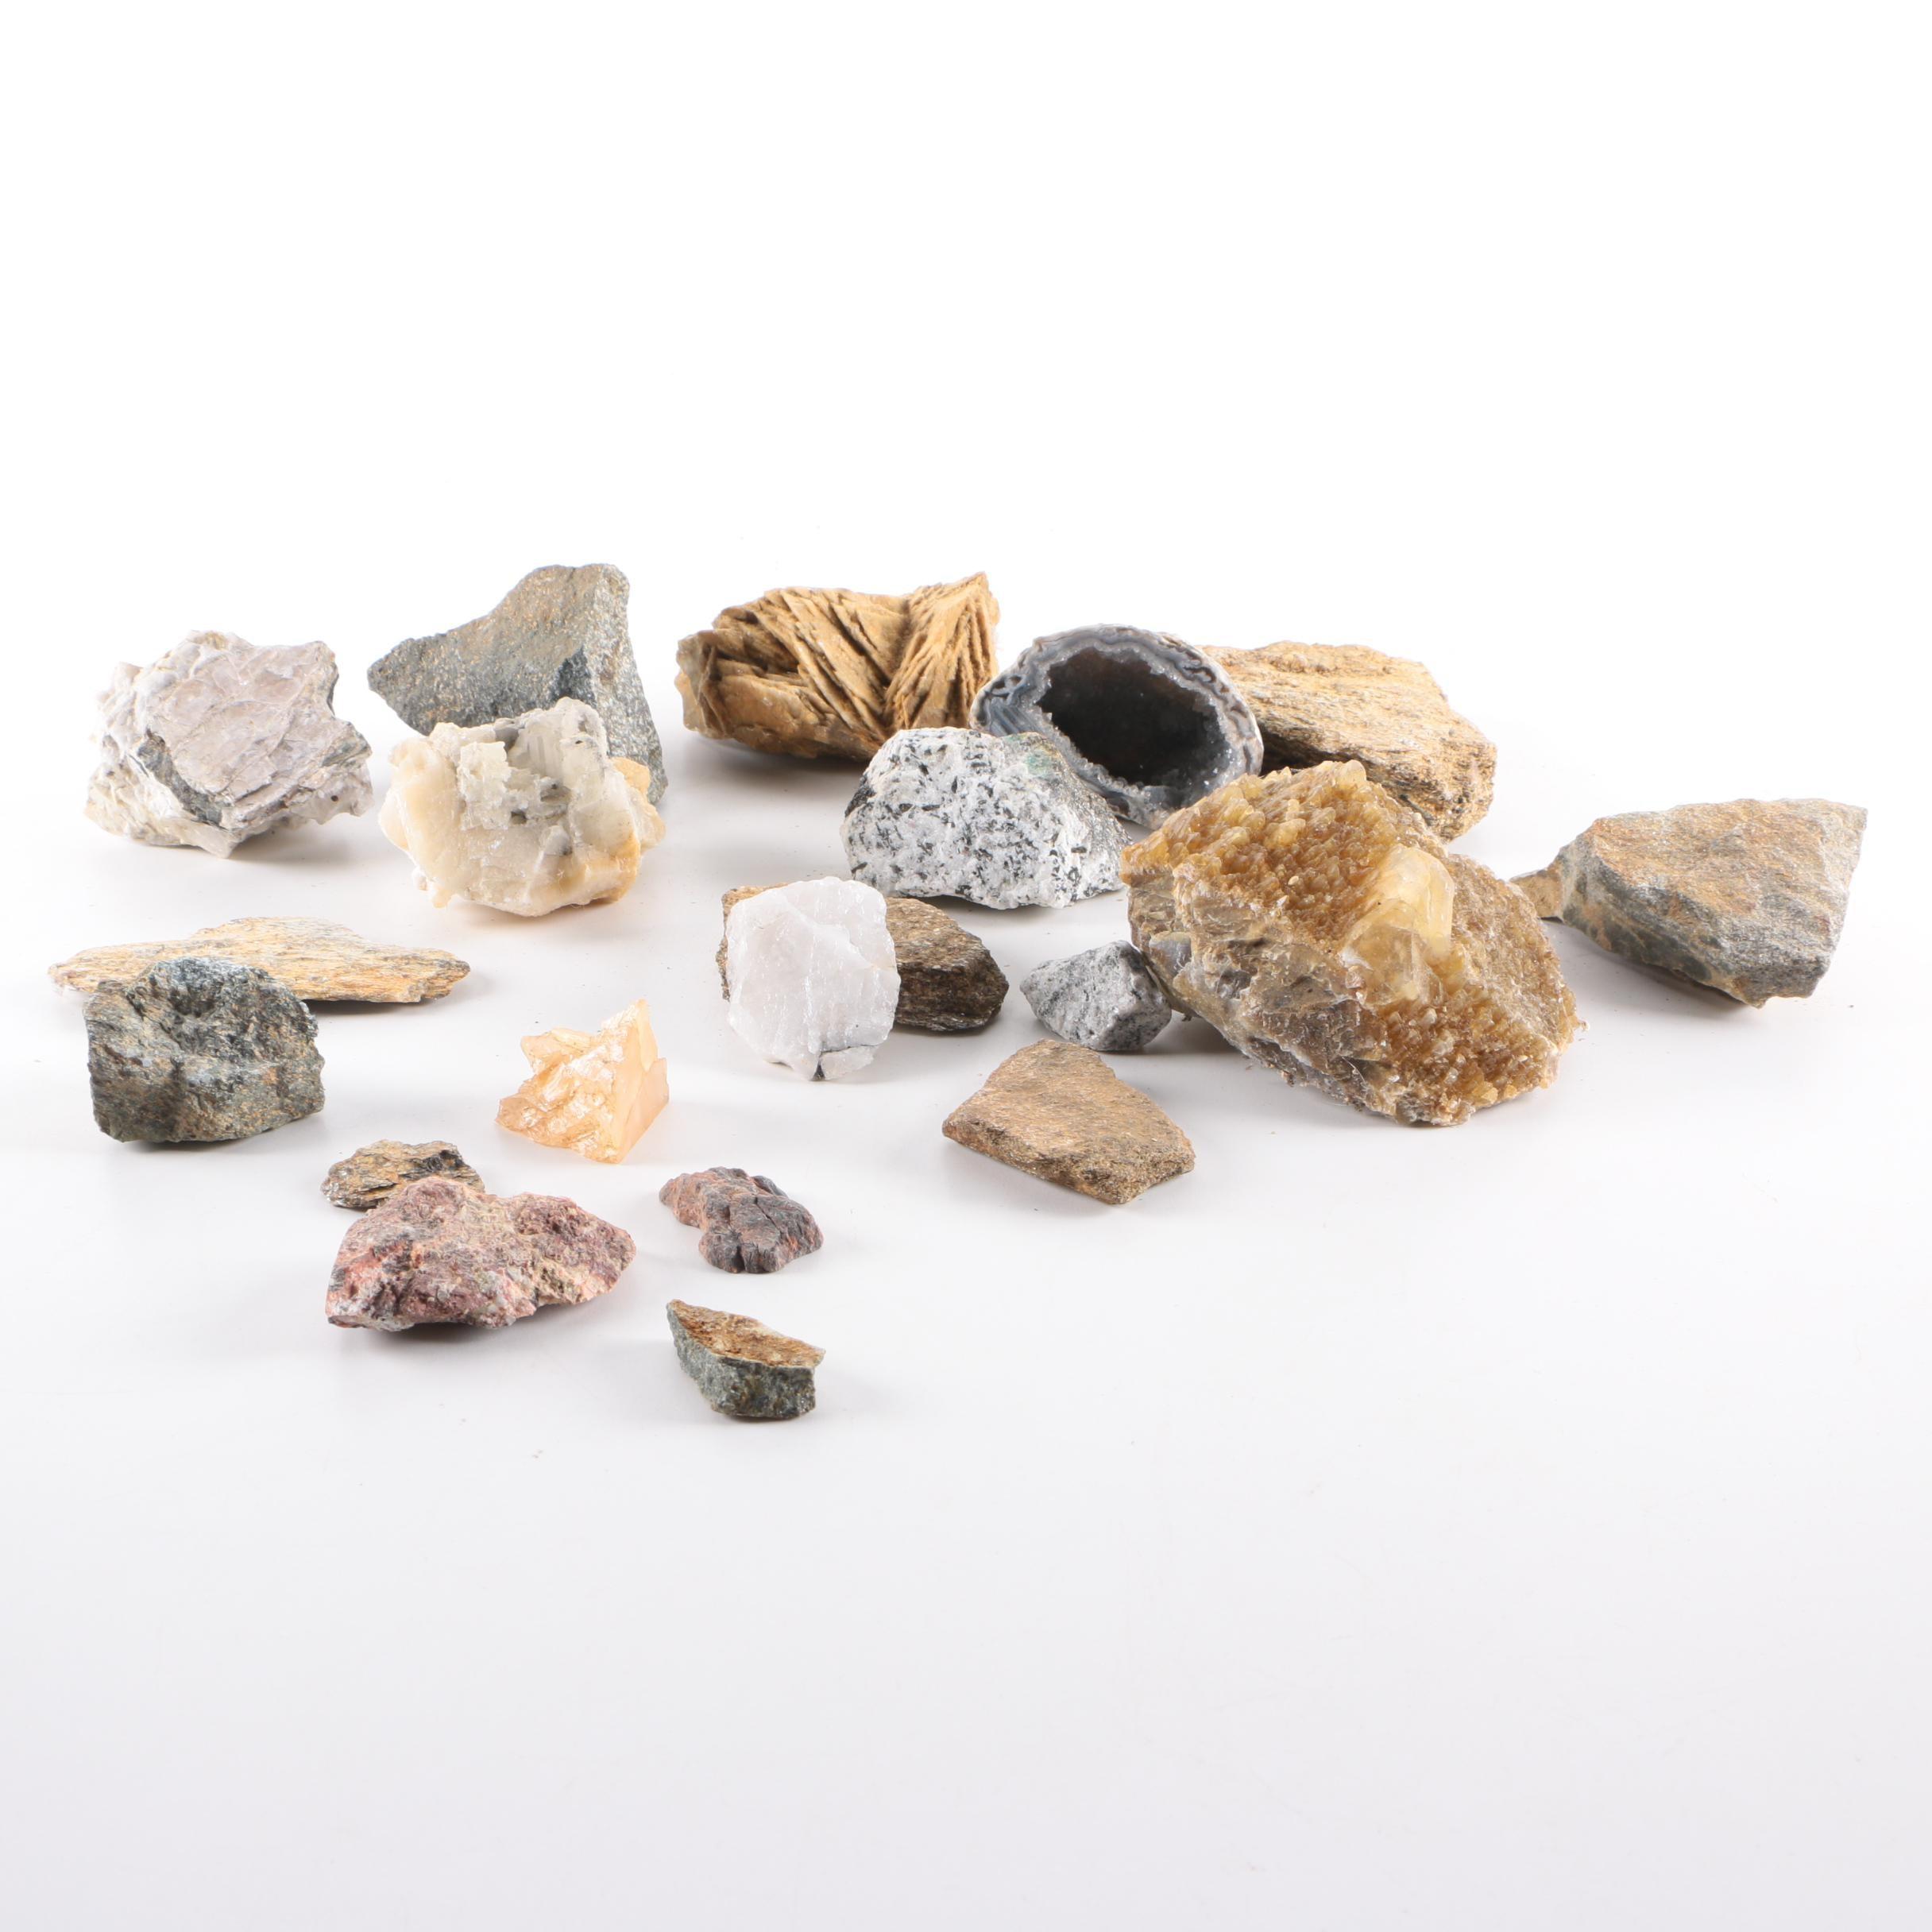 Geologic Specimens